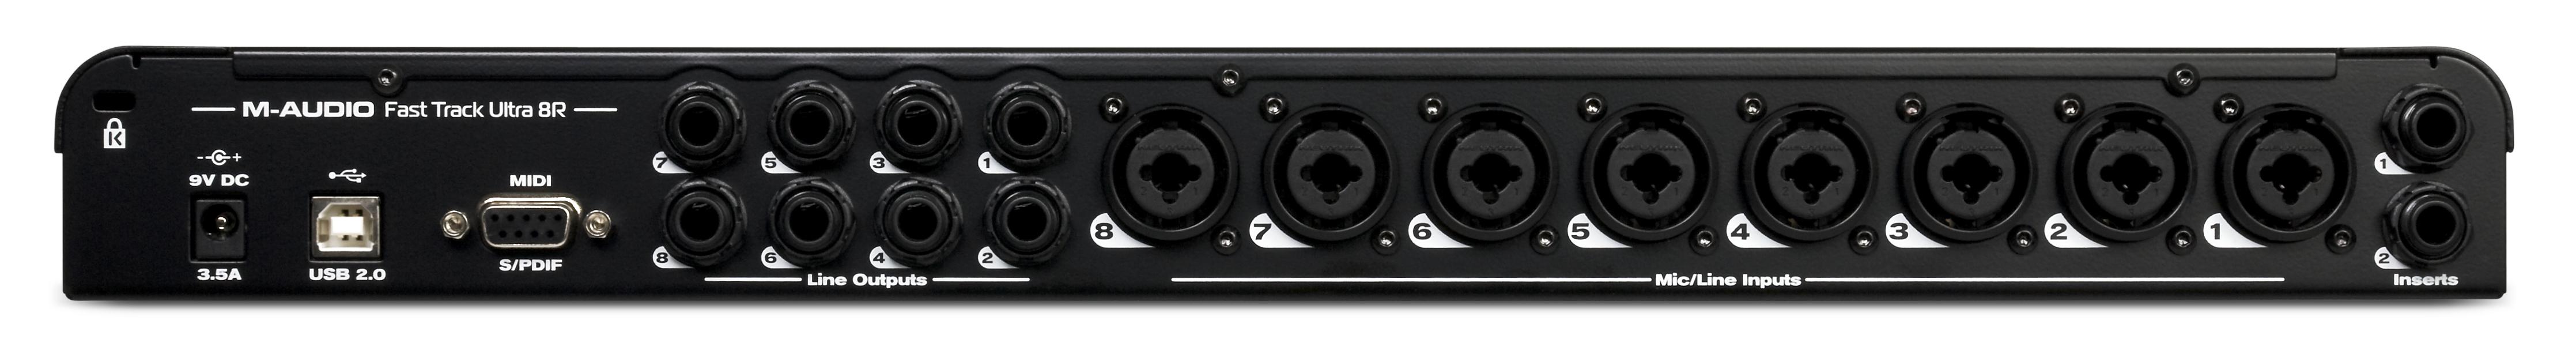 m audio fast track ultra 8r m audio fast track ultra 8r. Black Bedroom Furniture Sets. Home Design Ideas